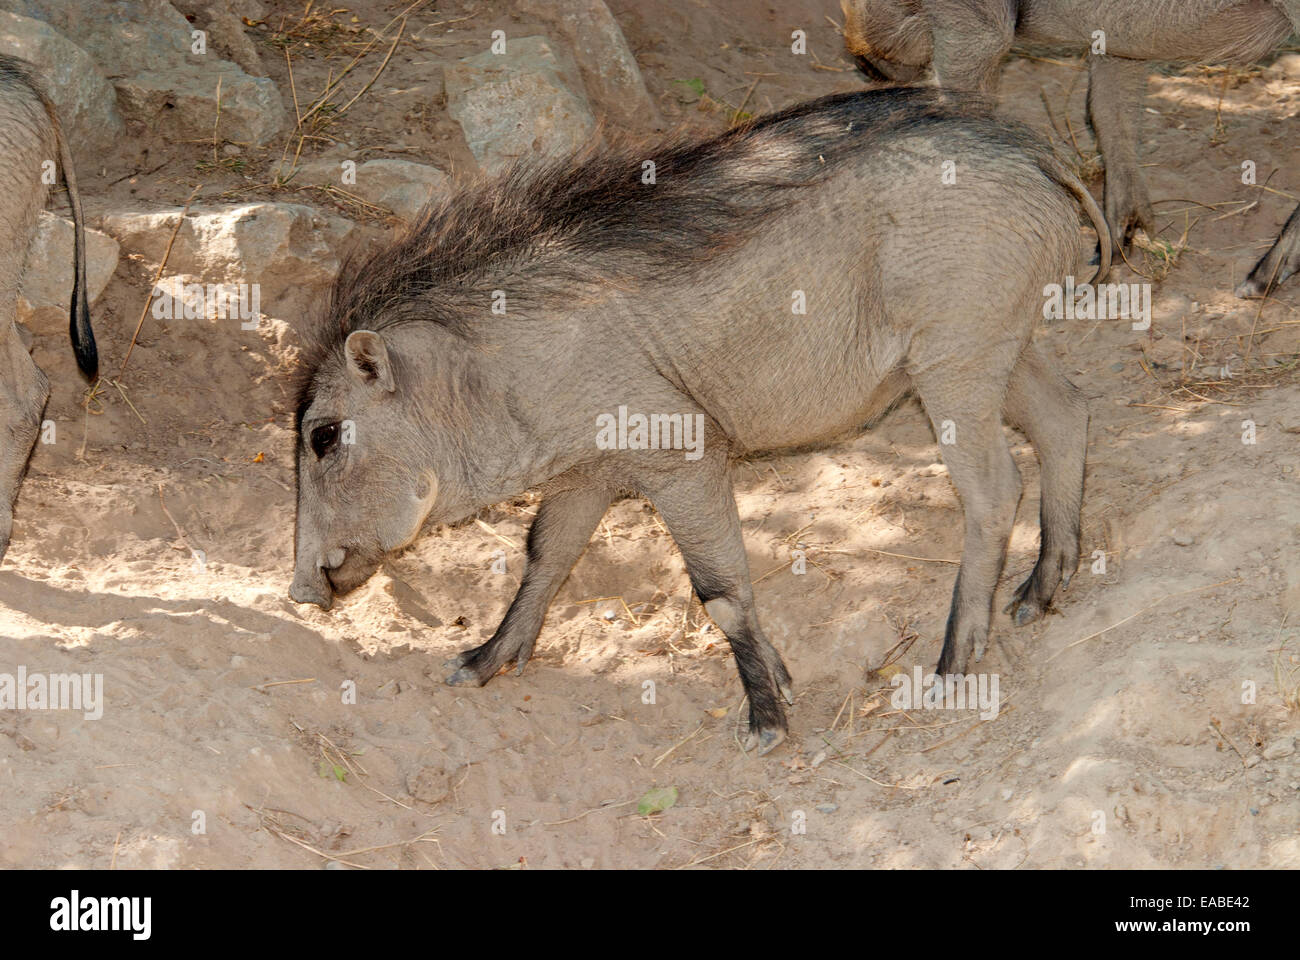 Warthog - Stock Image